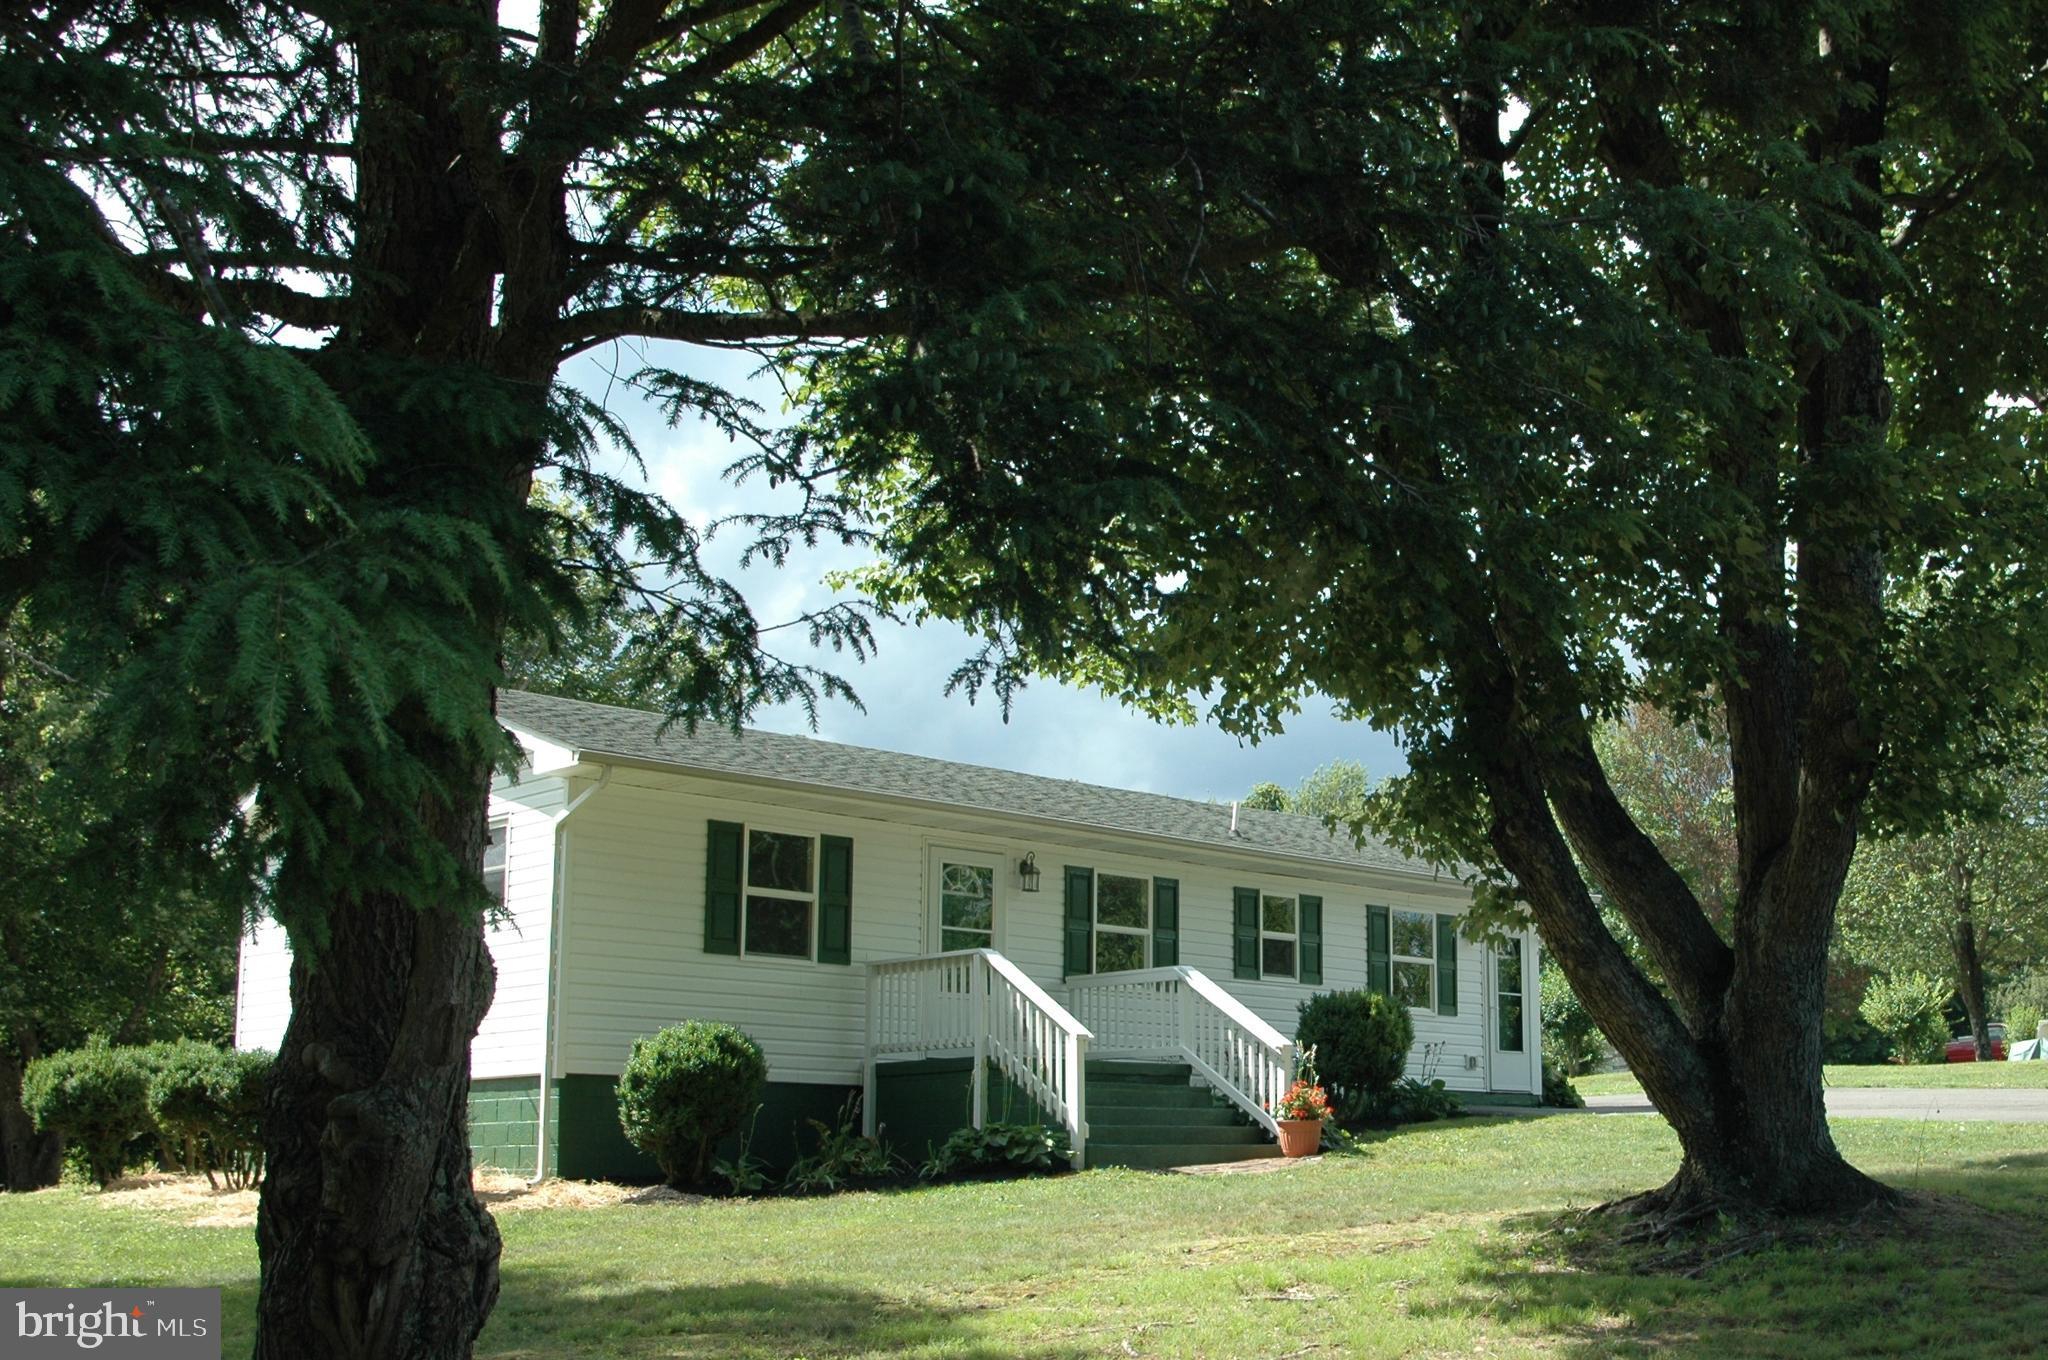 251 SCRABBLE ROAD, CASTLETON, VA 22716